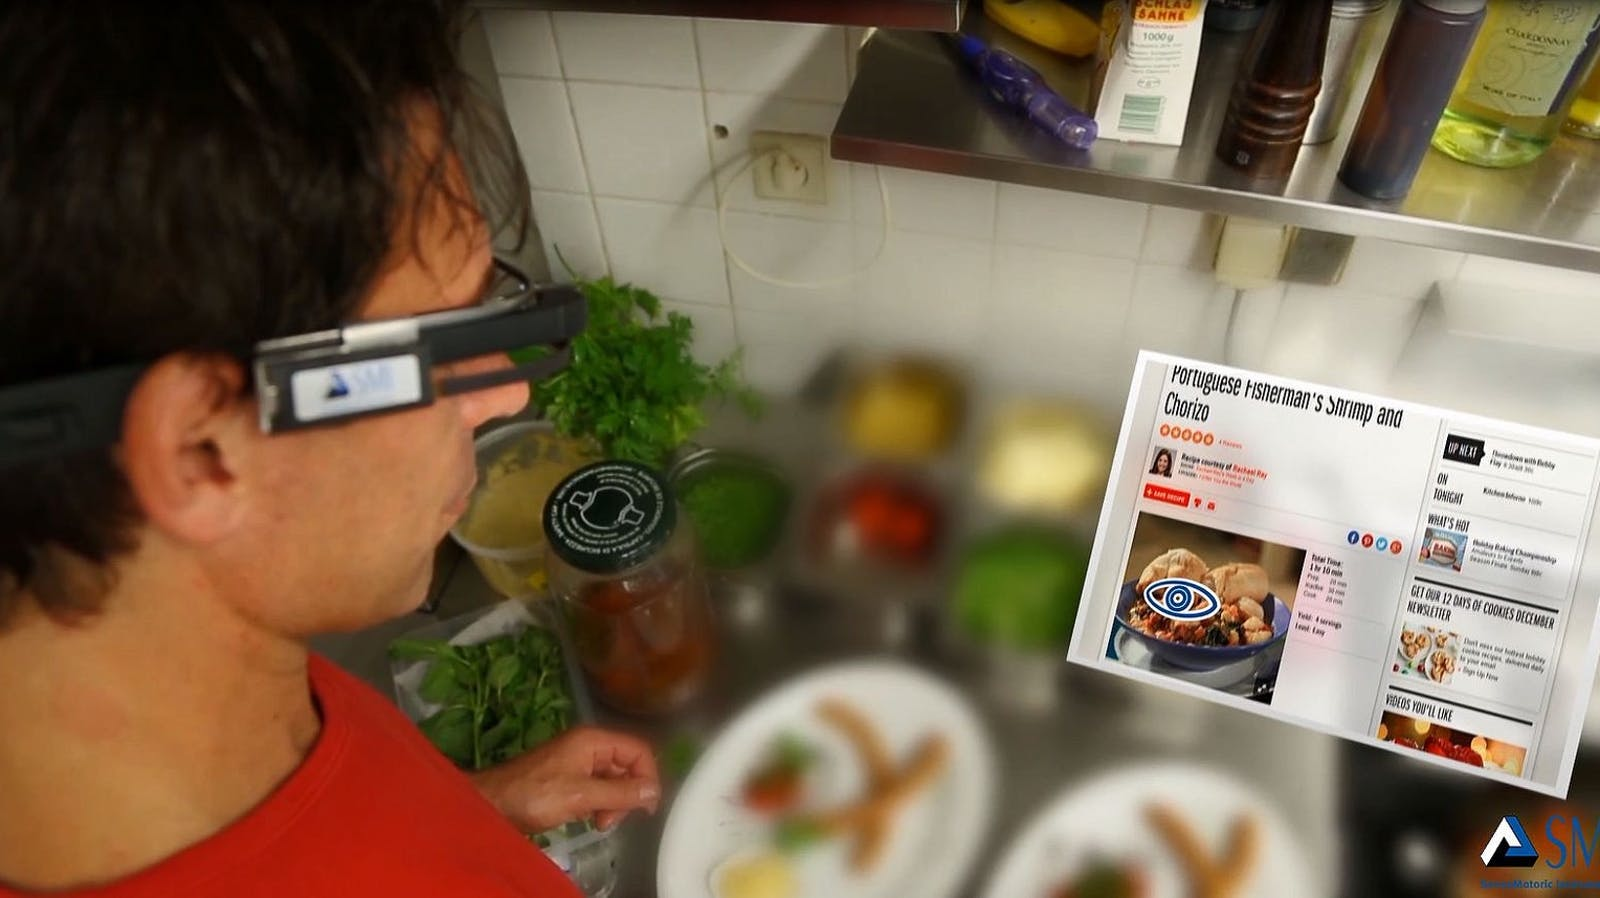 An artist's rendering of SMI's eye-tracking technology in AR glasses. Image courtesy of SMI.